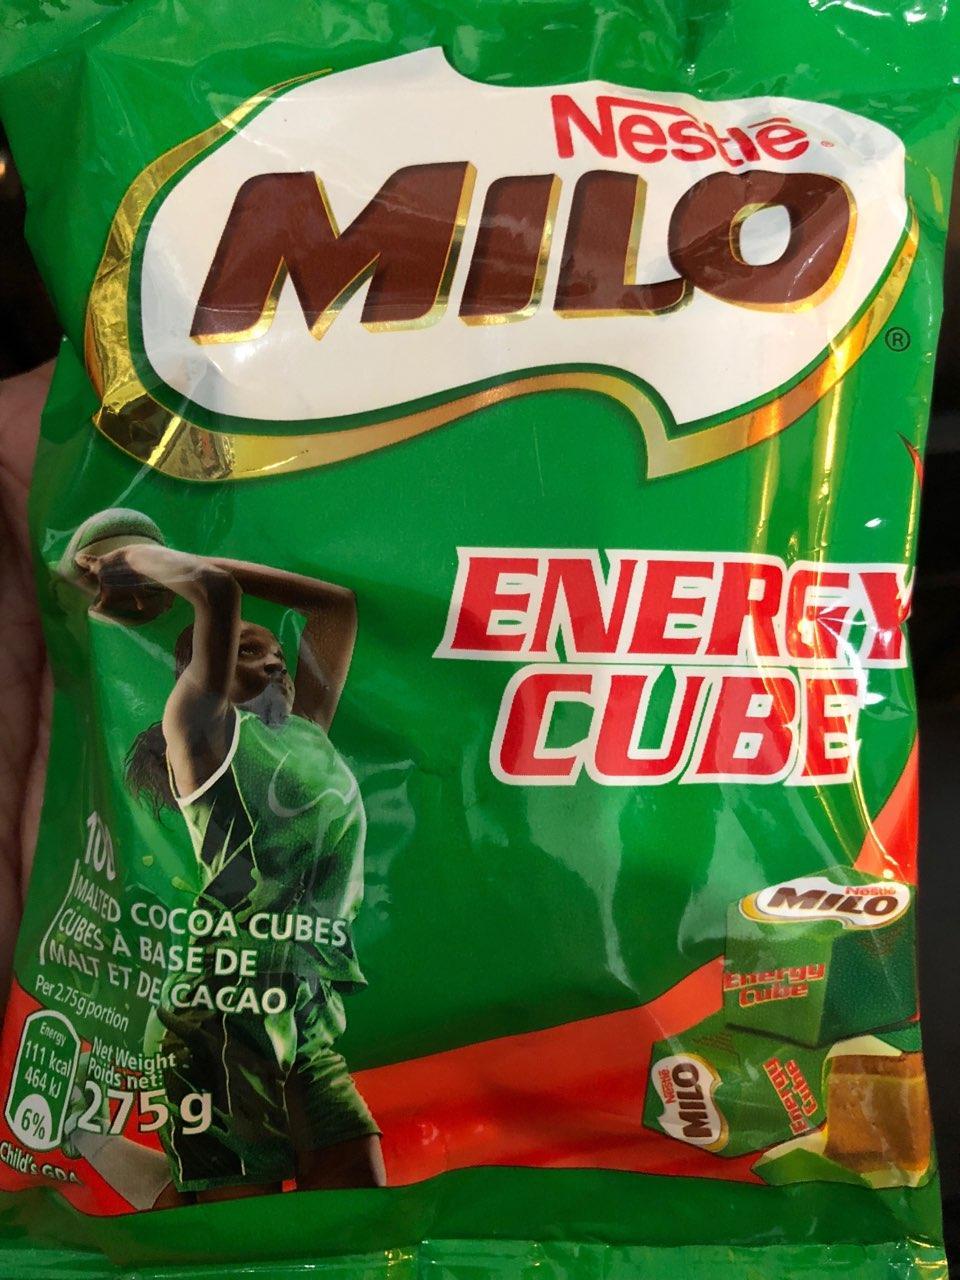 Milo Philippines Price List Nutri Up Chocolate Energy Drink Sachet Cubes 100